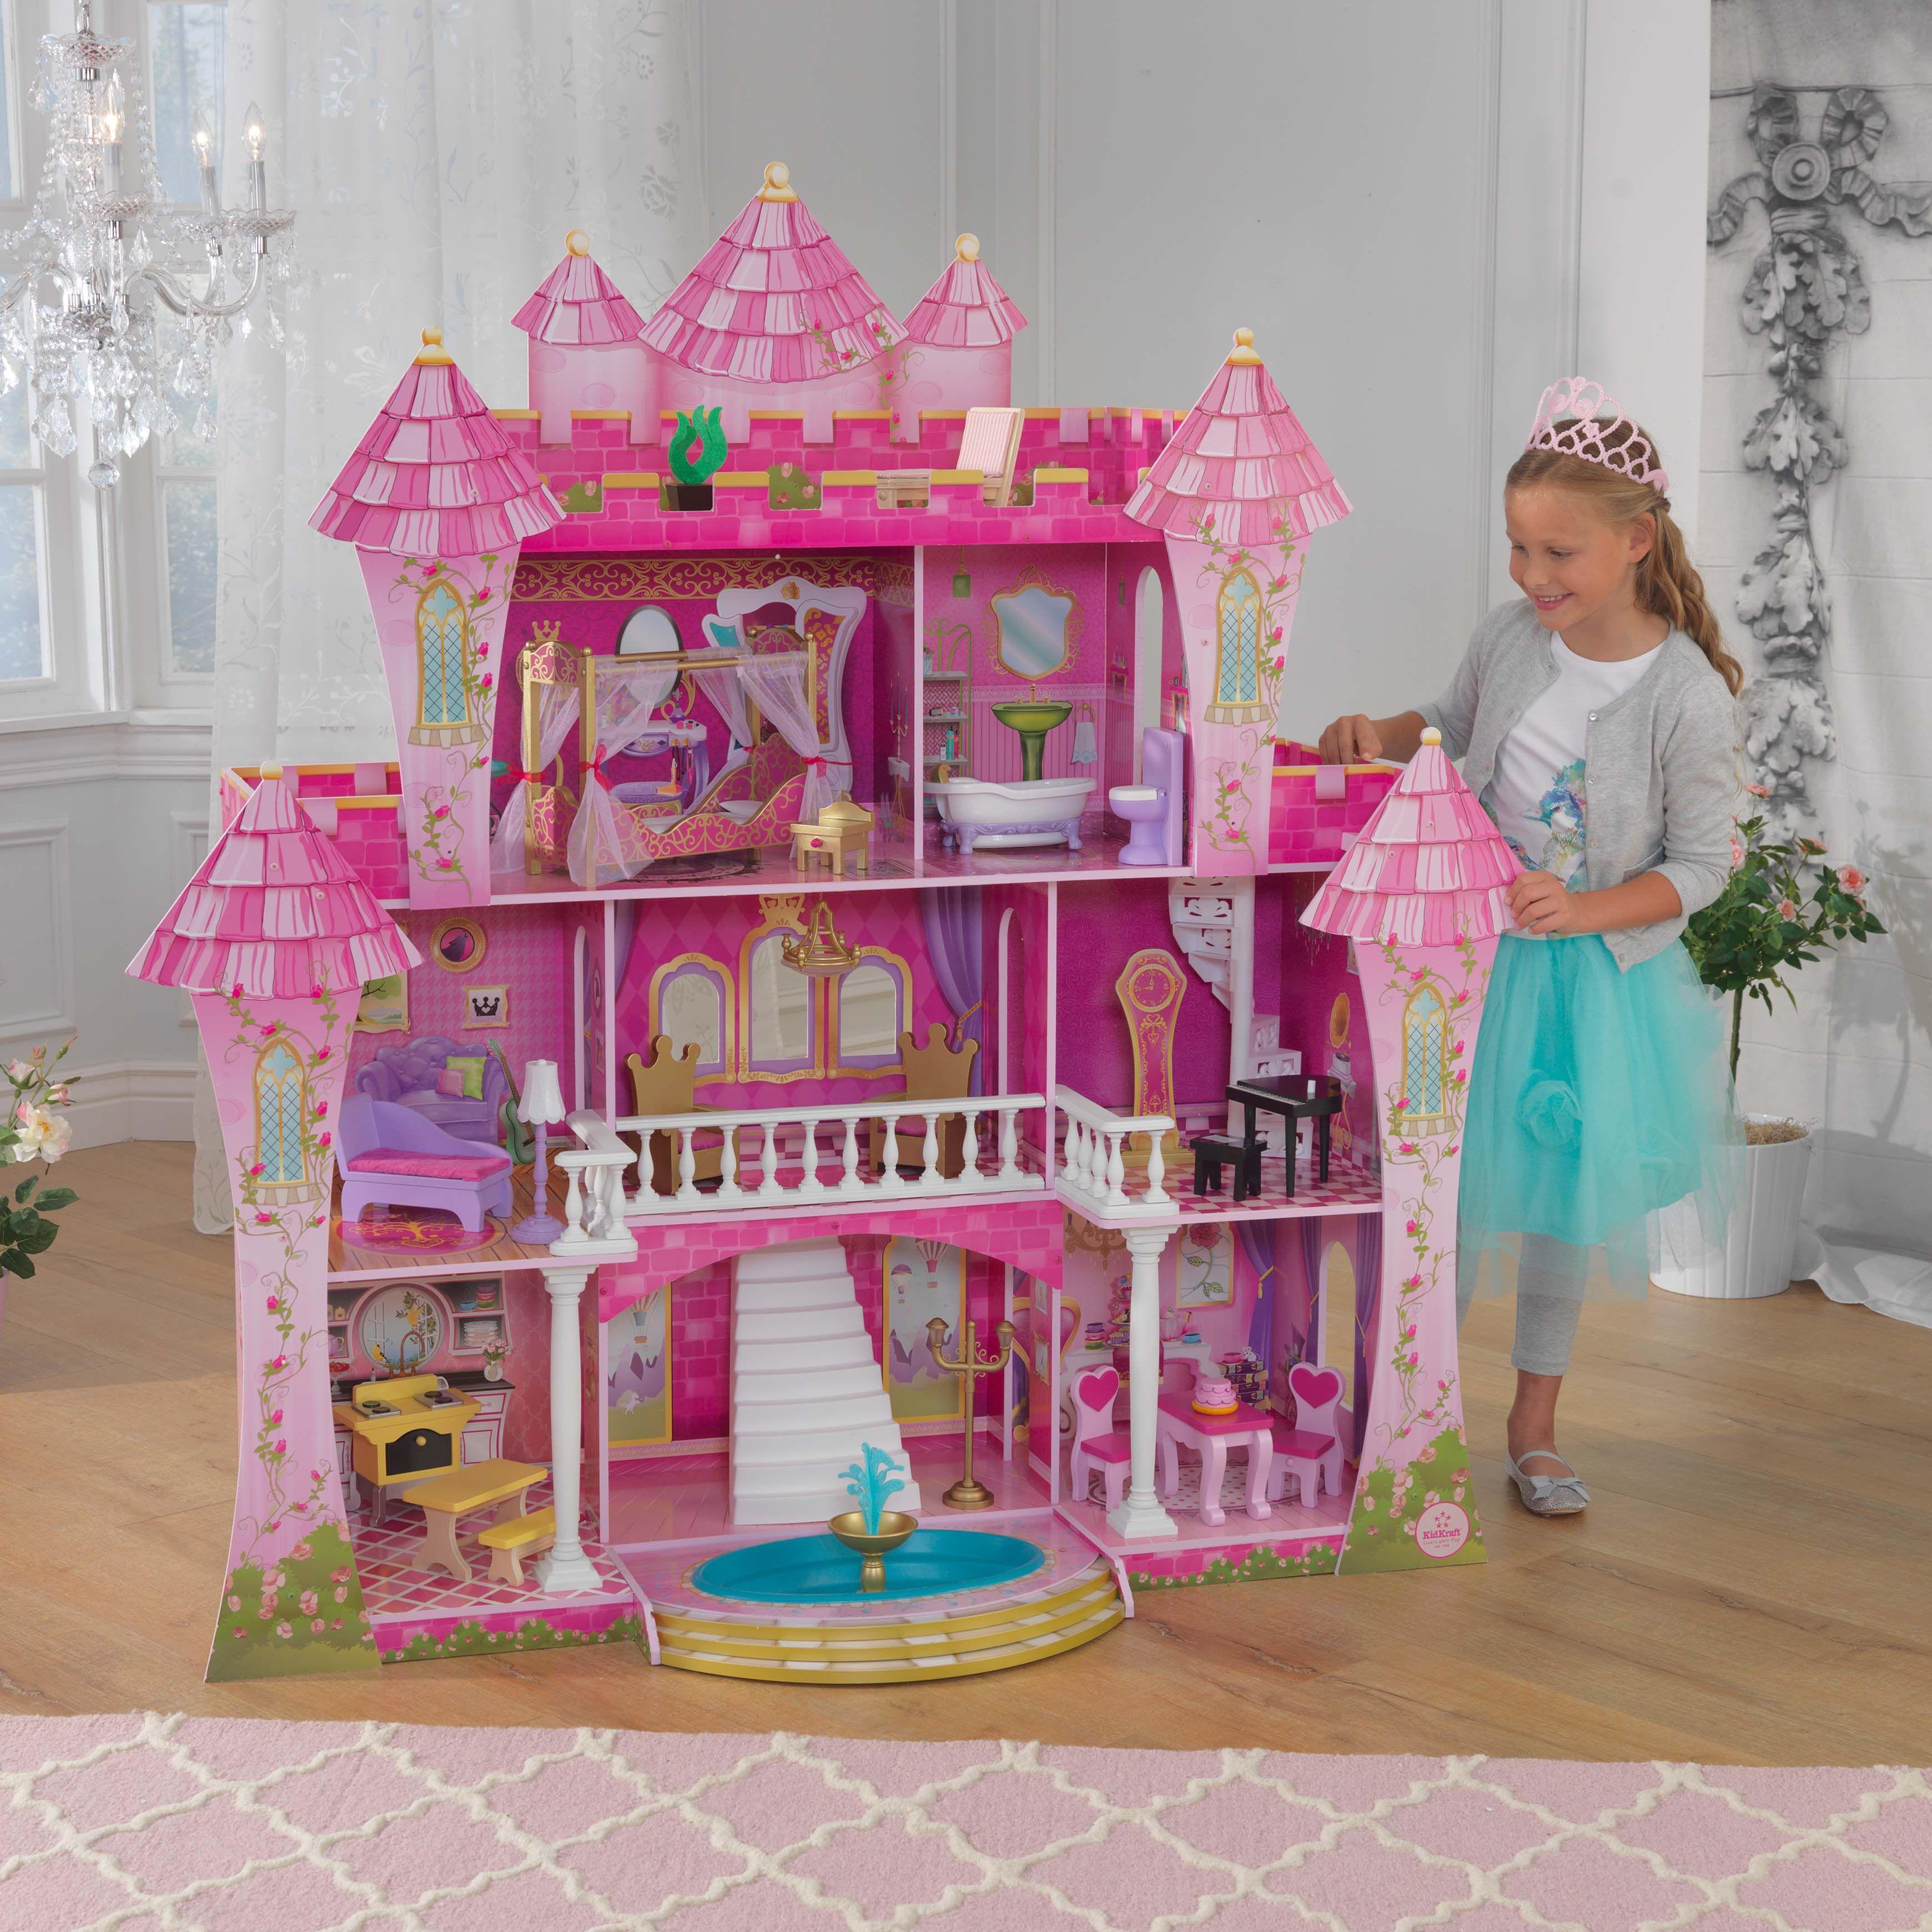 Kidkraft Far Far Away Dollhouse Doll House Barbie Kitchen